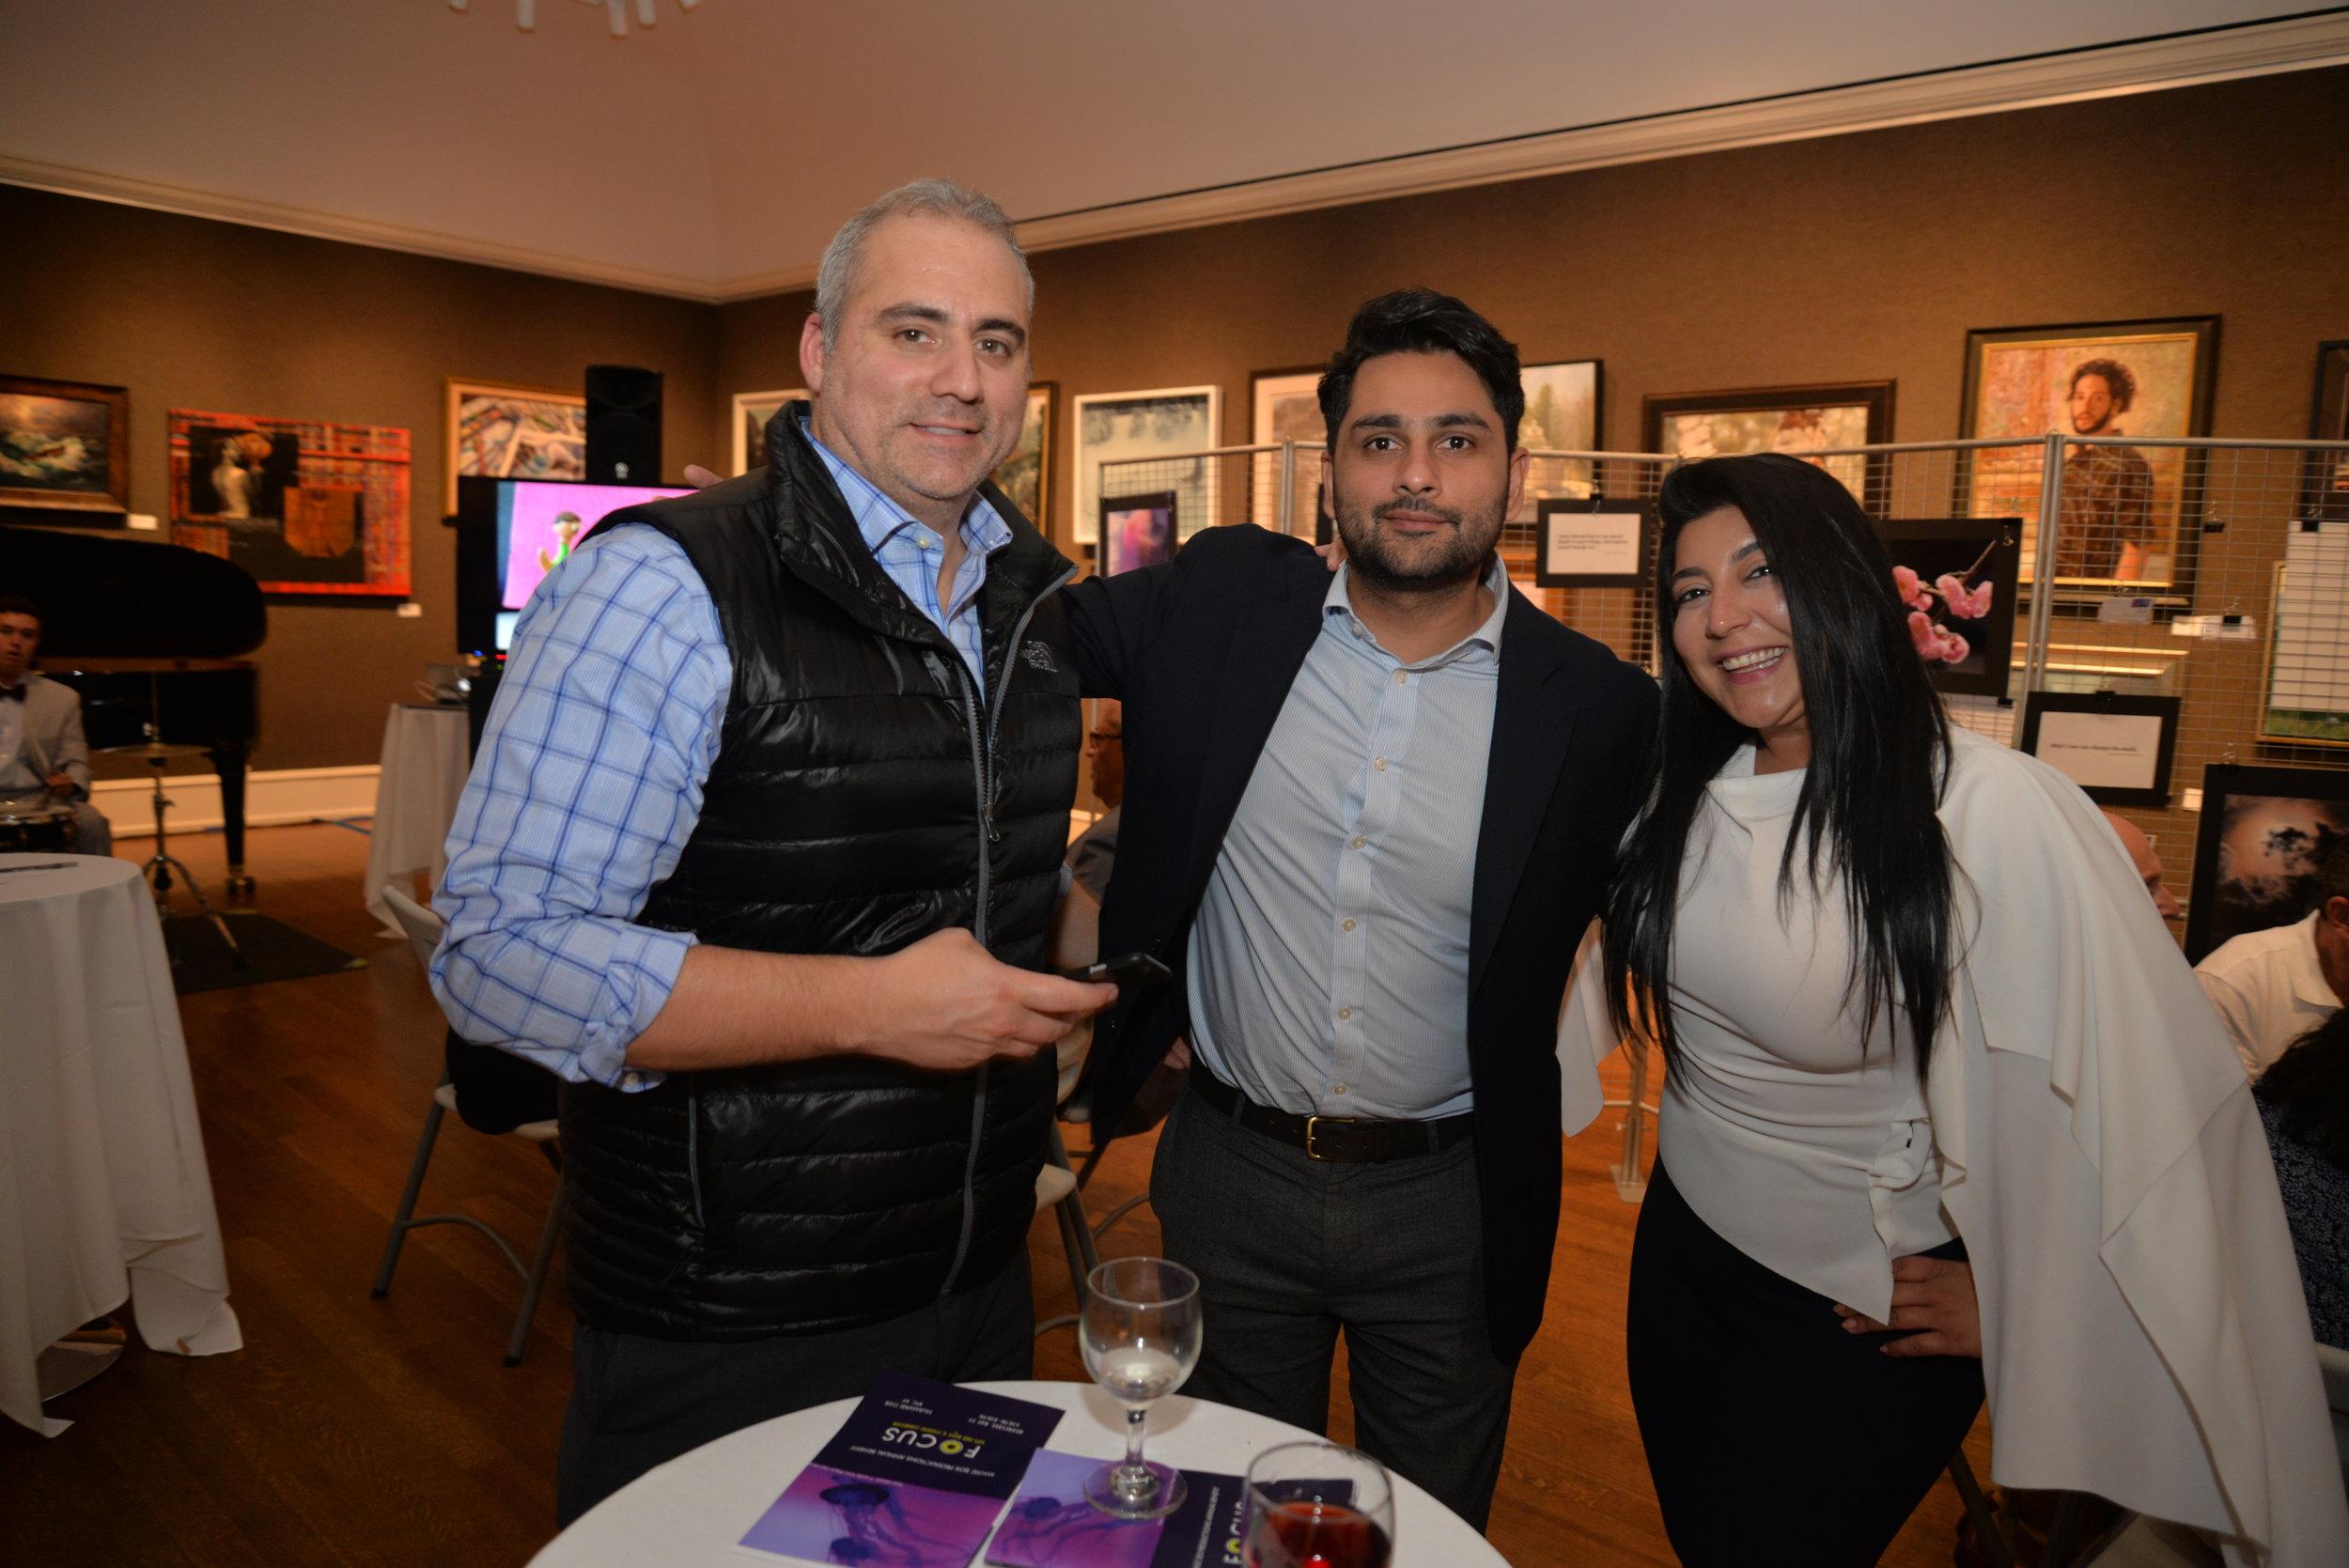 Richard Hervas, Sarfaraz Rajan, and Shireen Hilal]